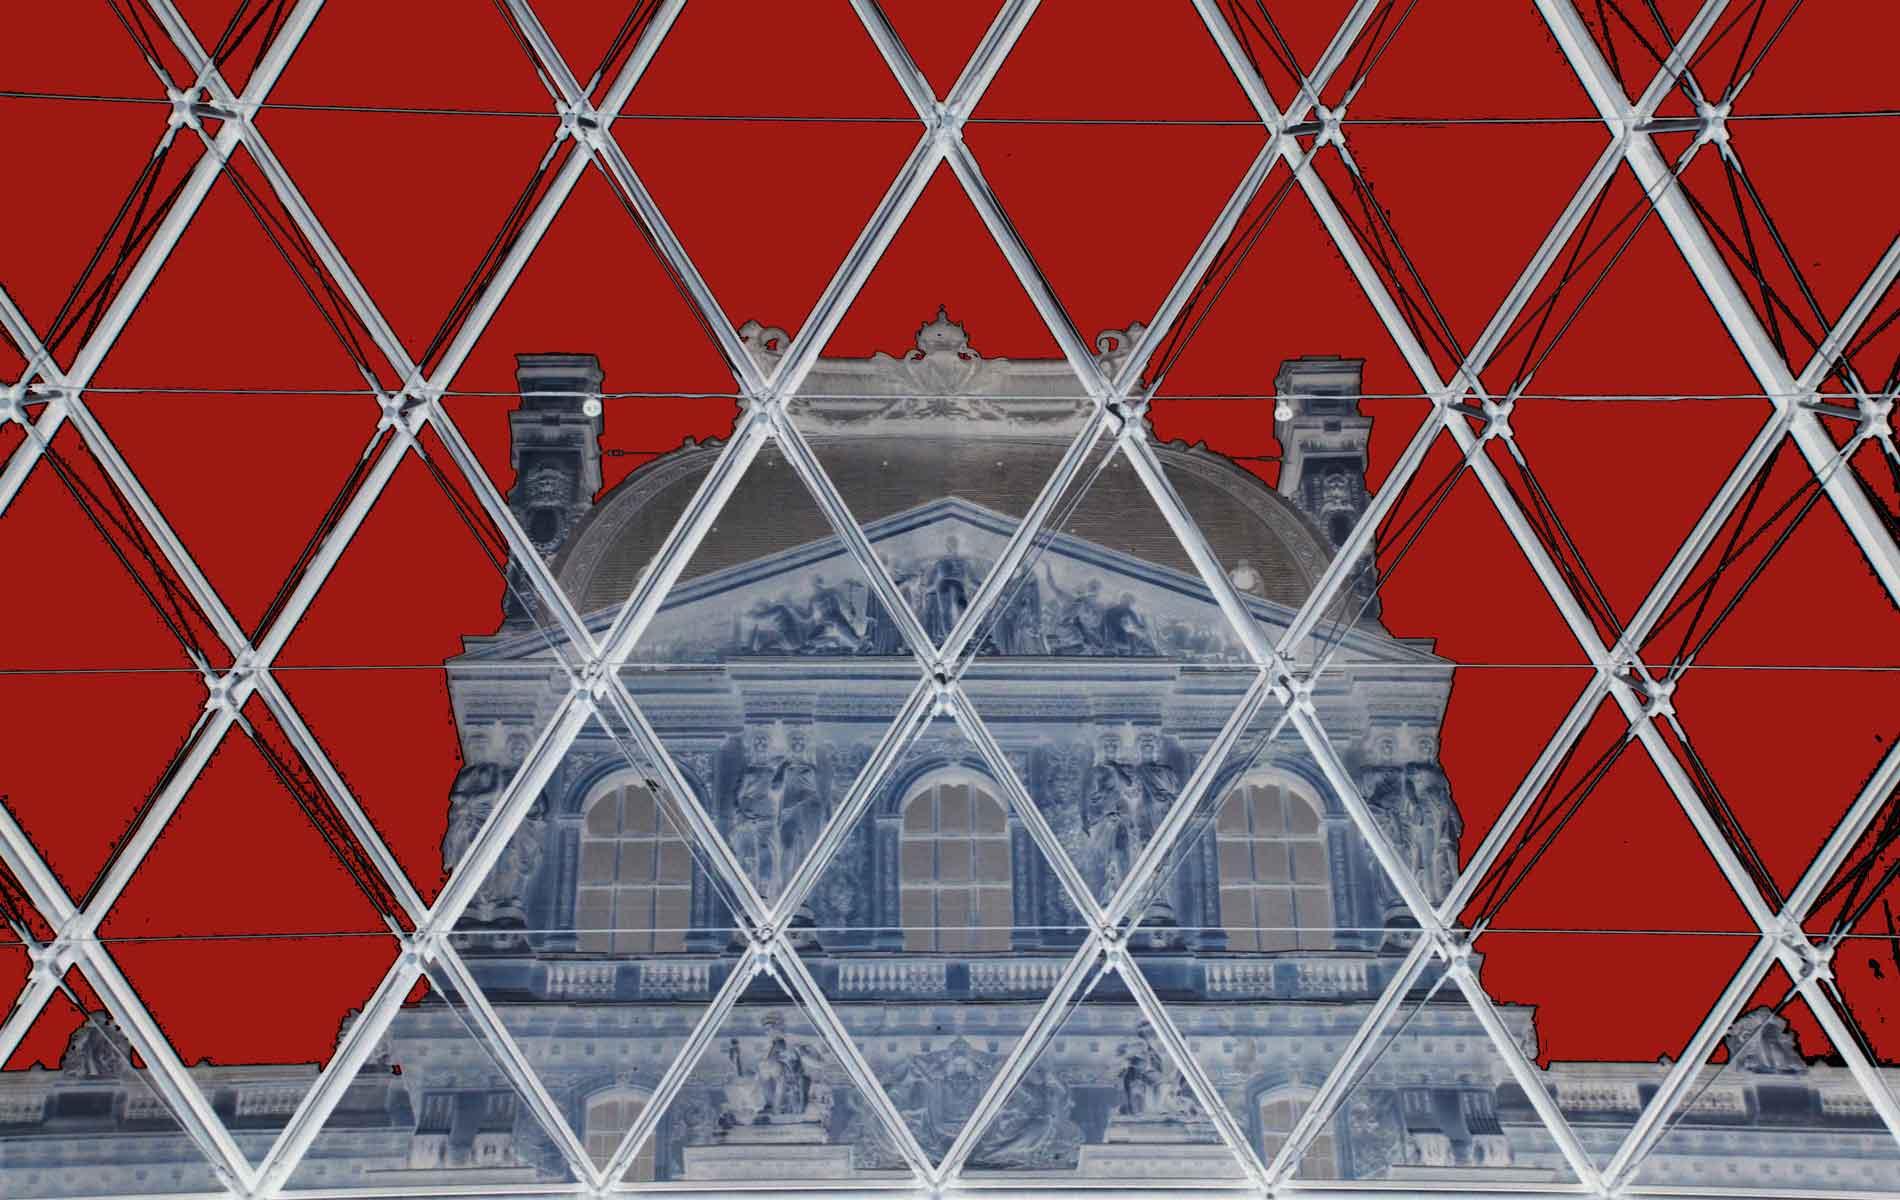 4. Prison Baroque n. 1  -  Baroque Jail n.1 - © Graziano Villa